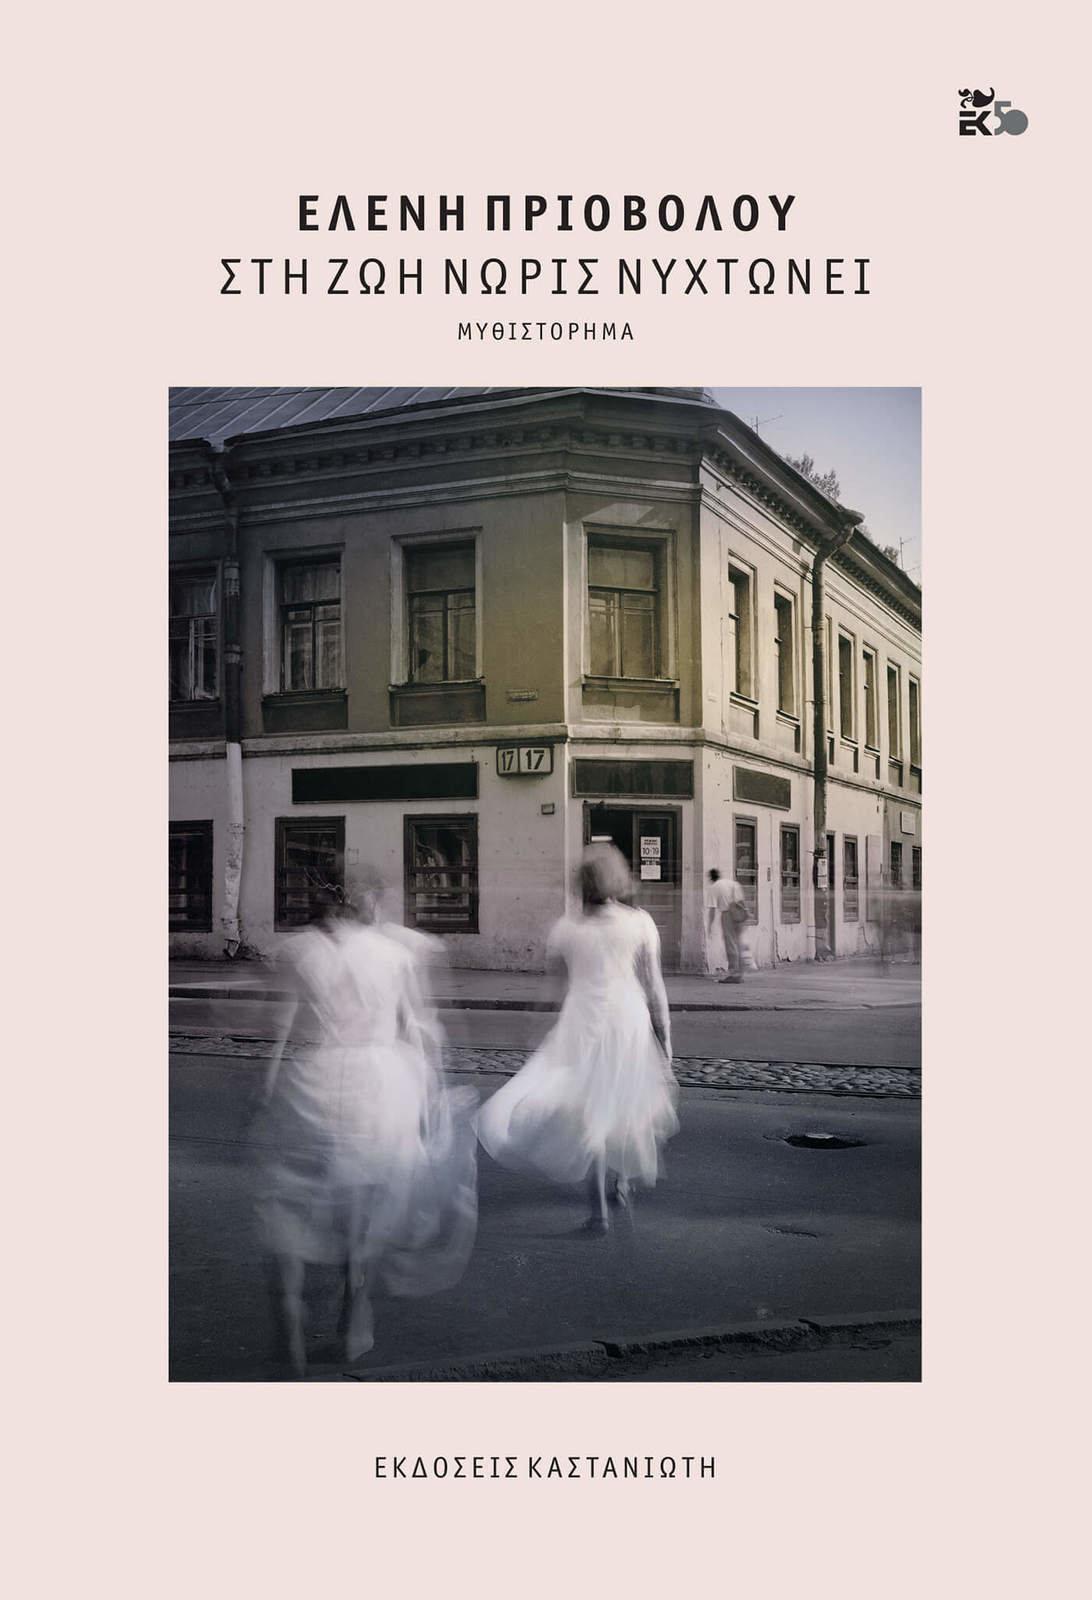 PRIOVOLOU NYXTONEI 6560 3 copy